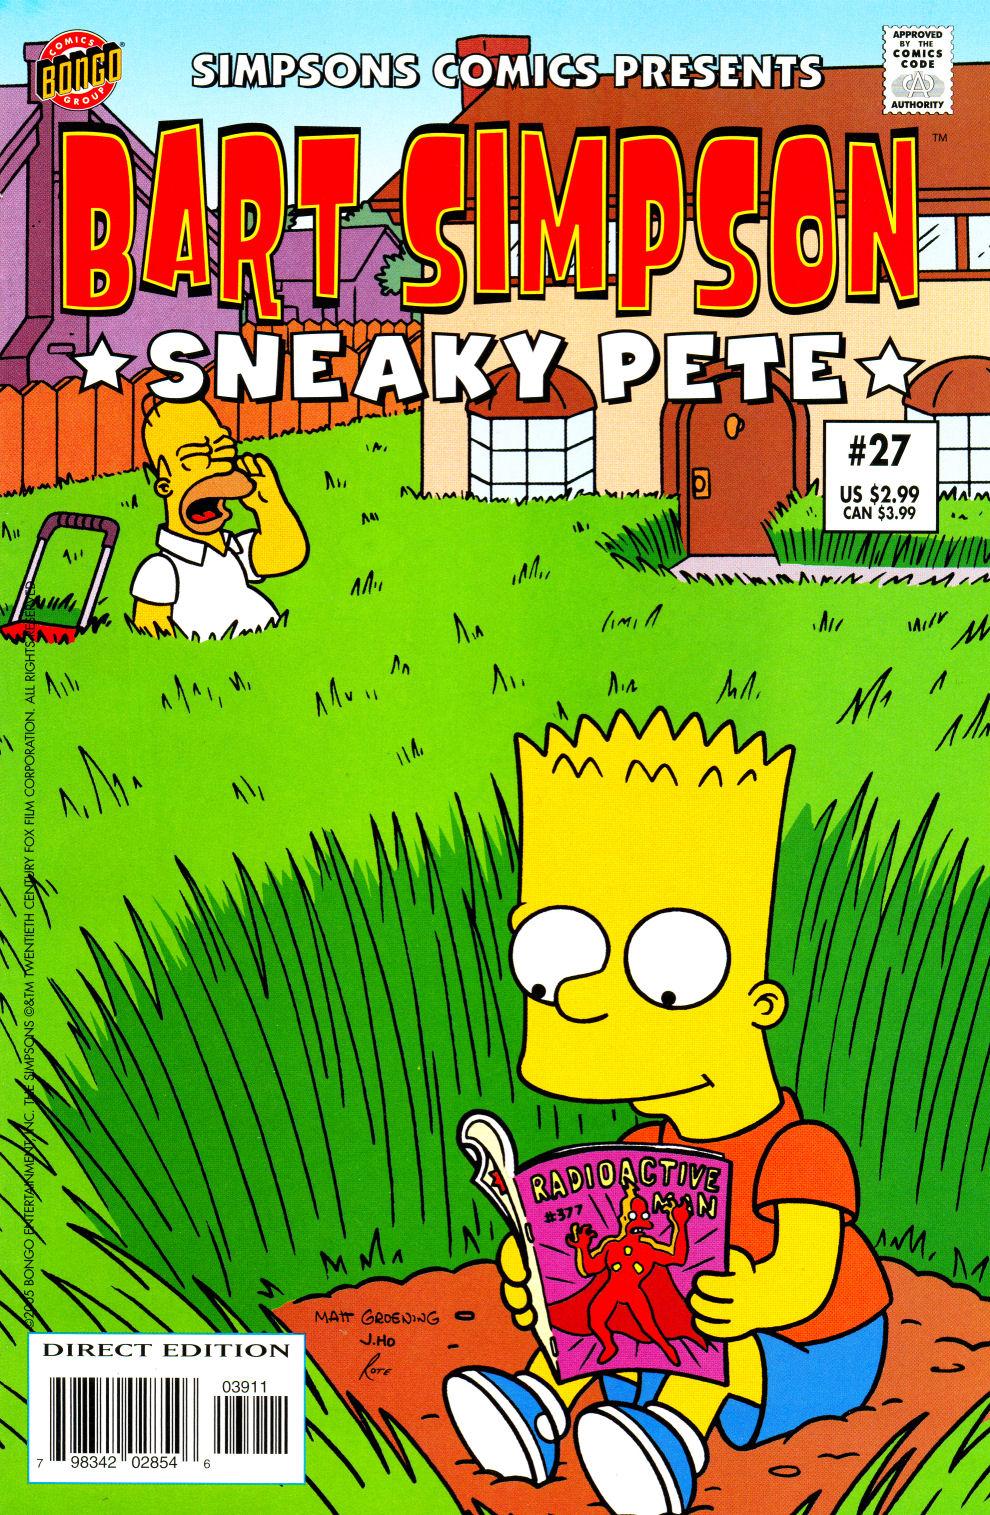 Read online Simpsons Comics Presents Bart Simpson comic -  Issue #27 - 1